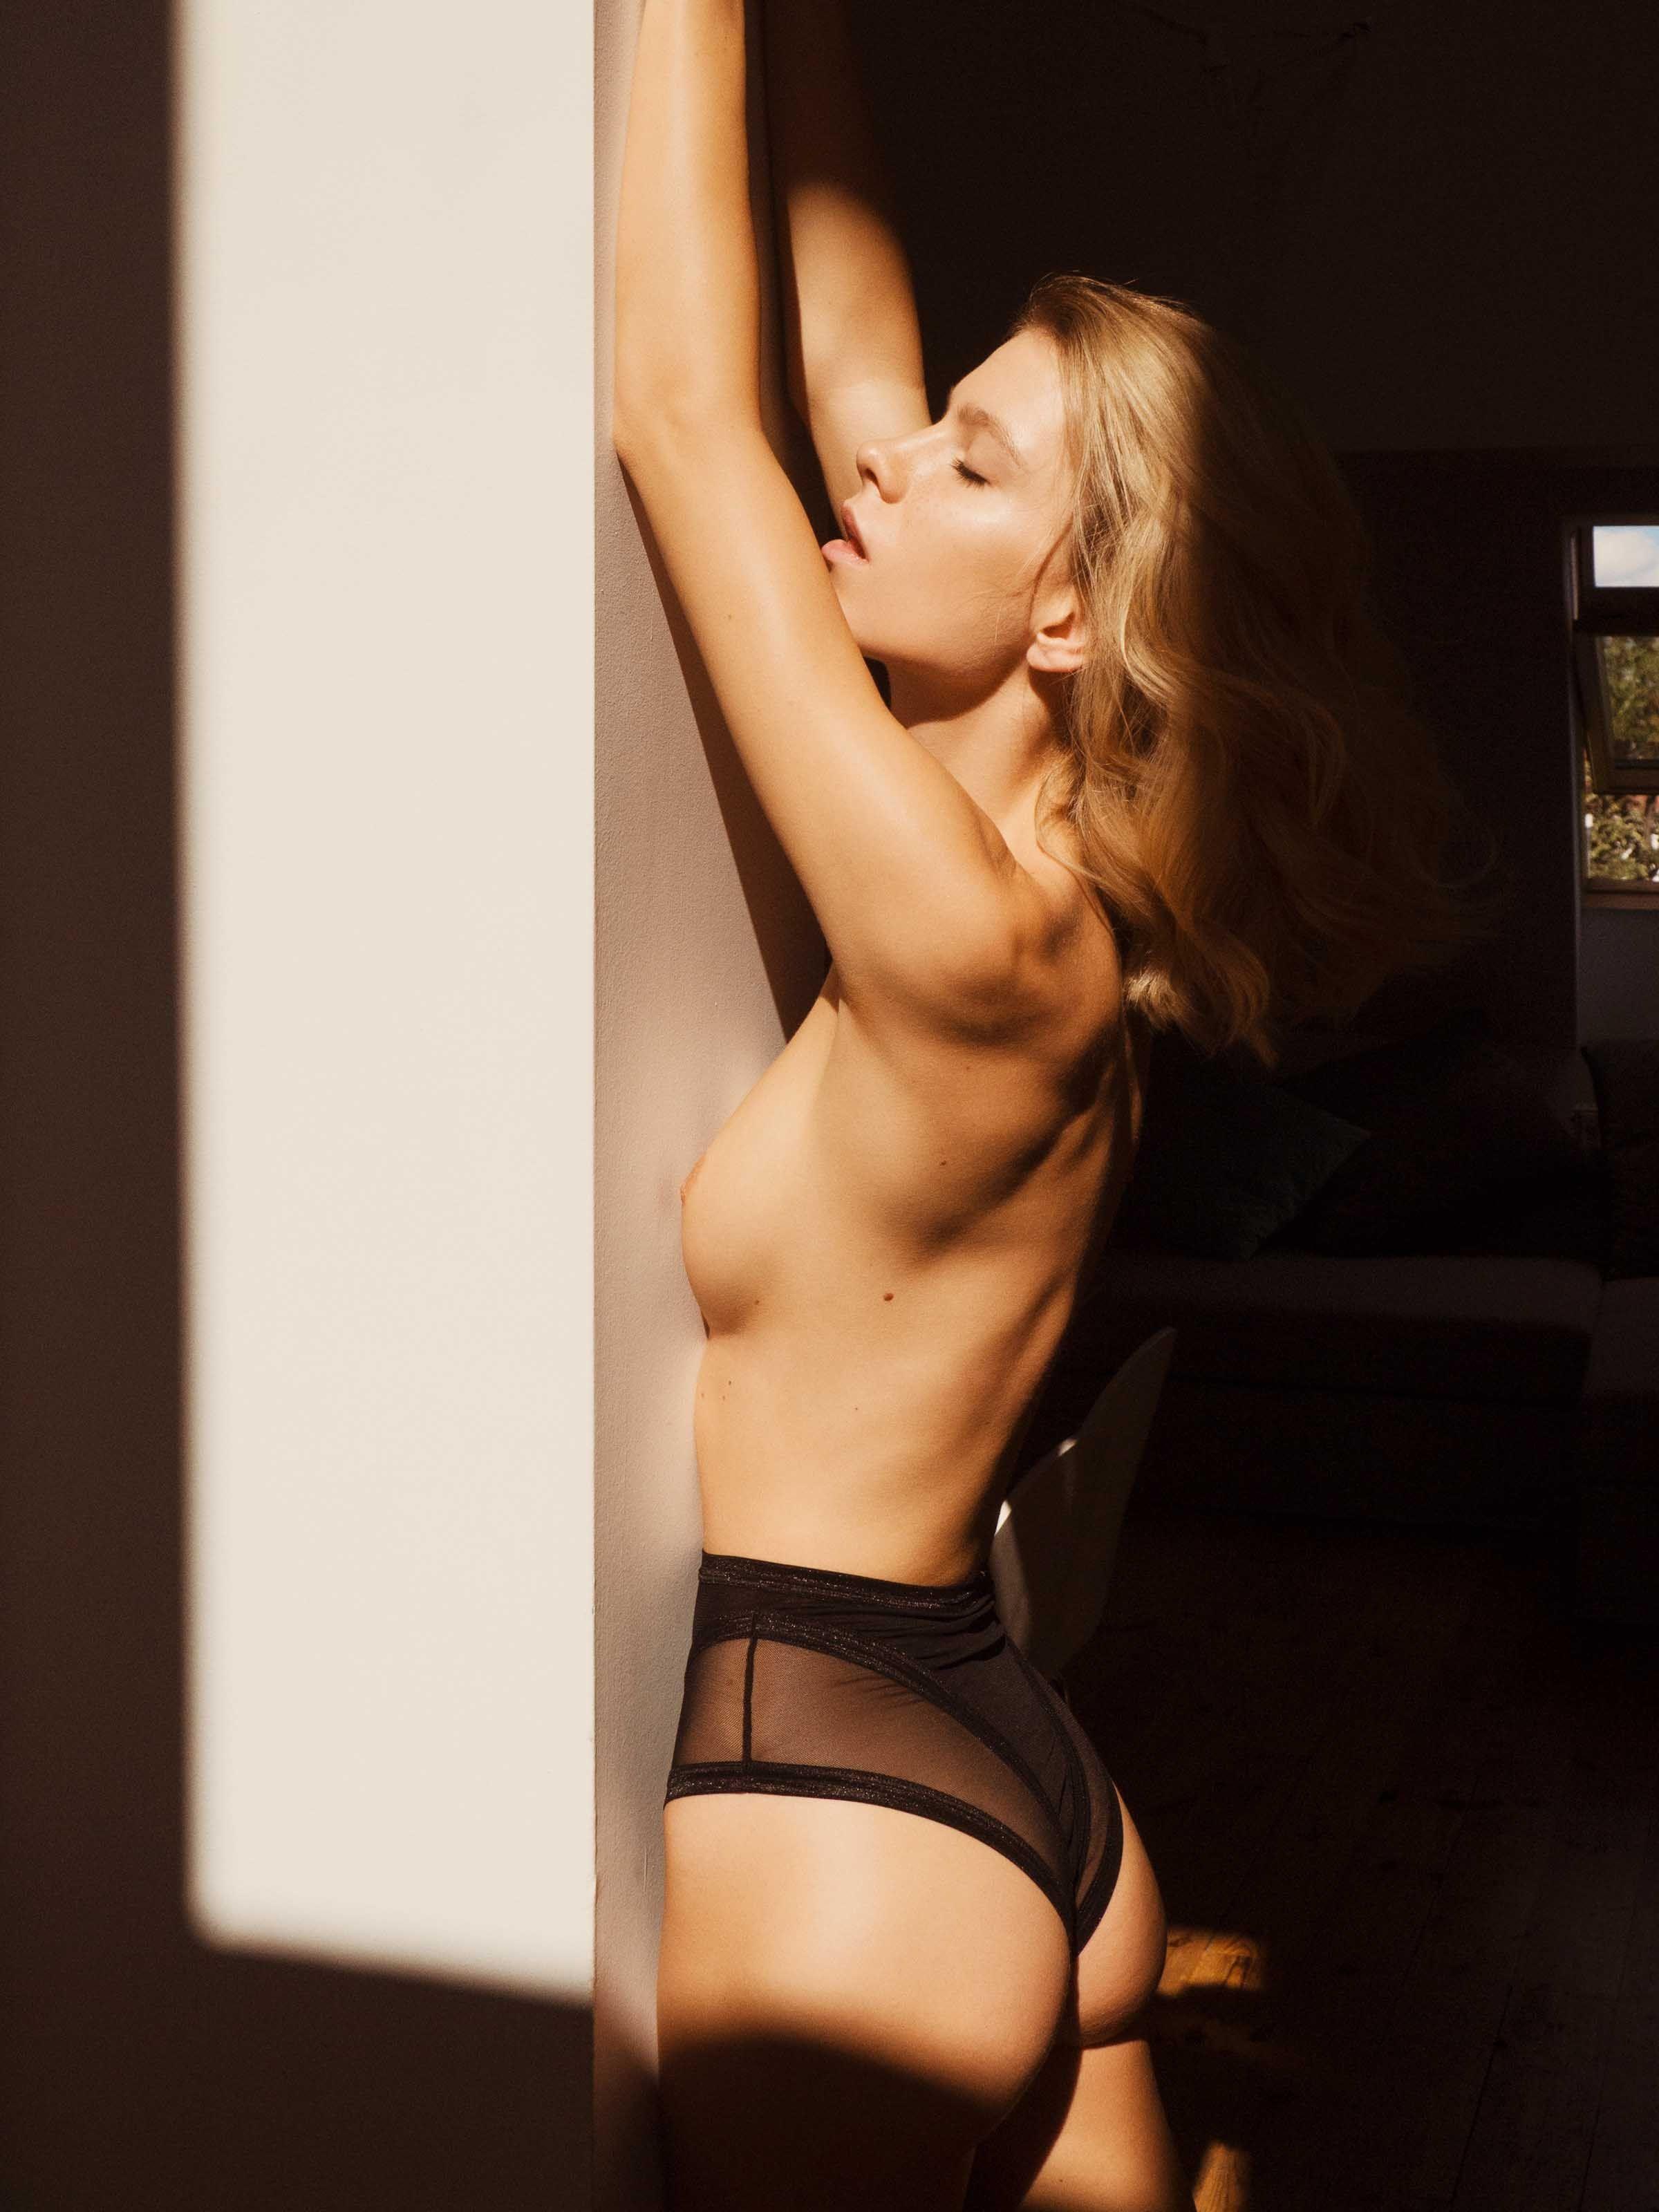 Angela Pelada angela abbott nude . xxx sex images. comments: 2